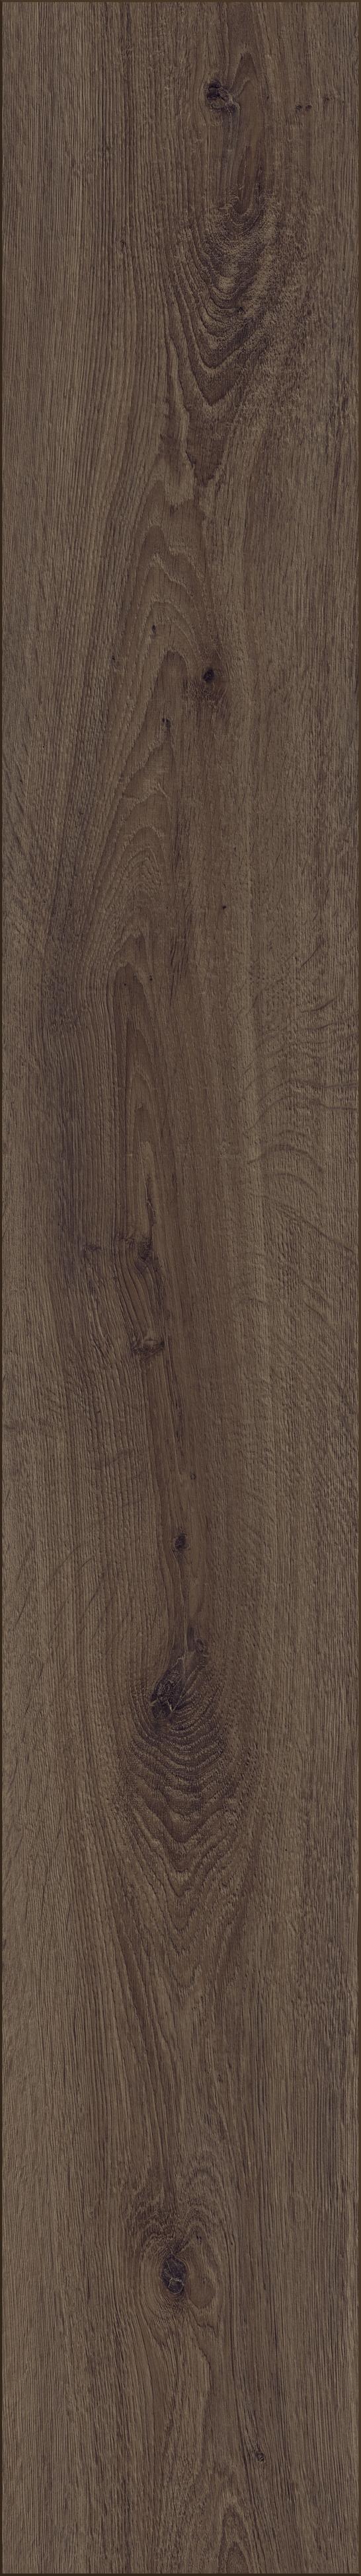 kronotex exquisit prestige oak dark d 4168 from kronotex. Black Bedroom Furniture Sets. Home Design Ideas